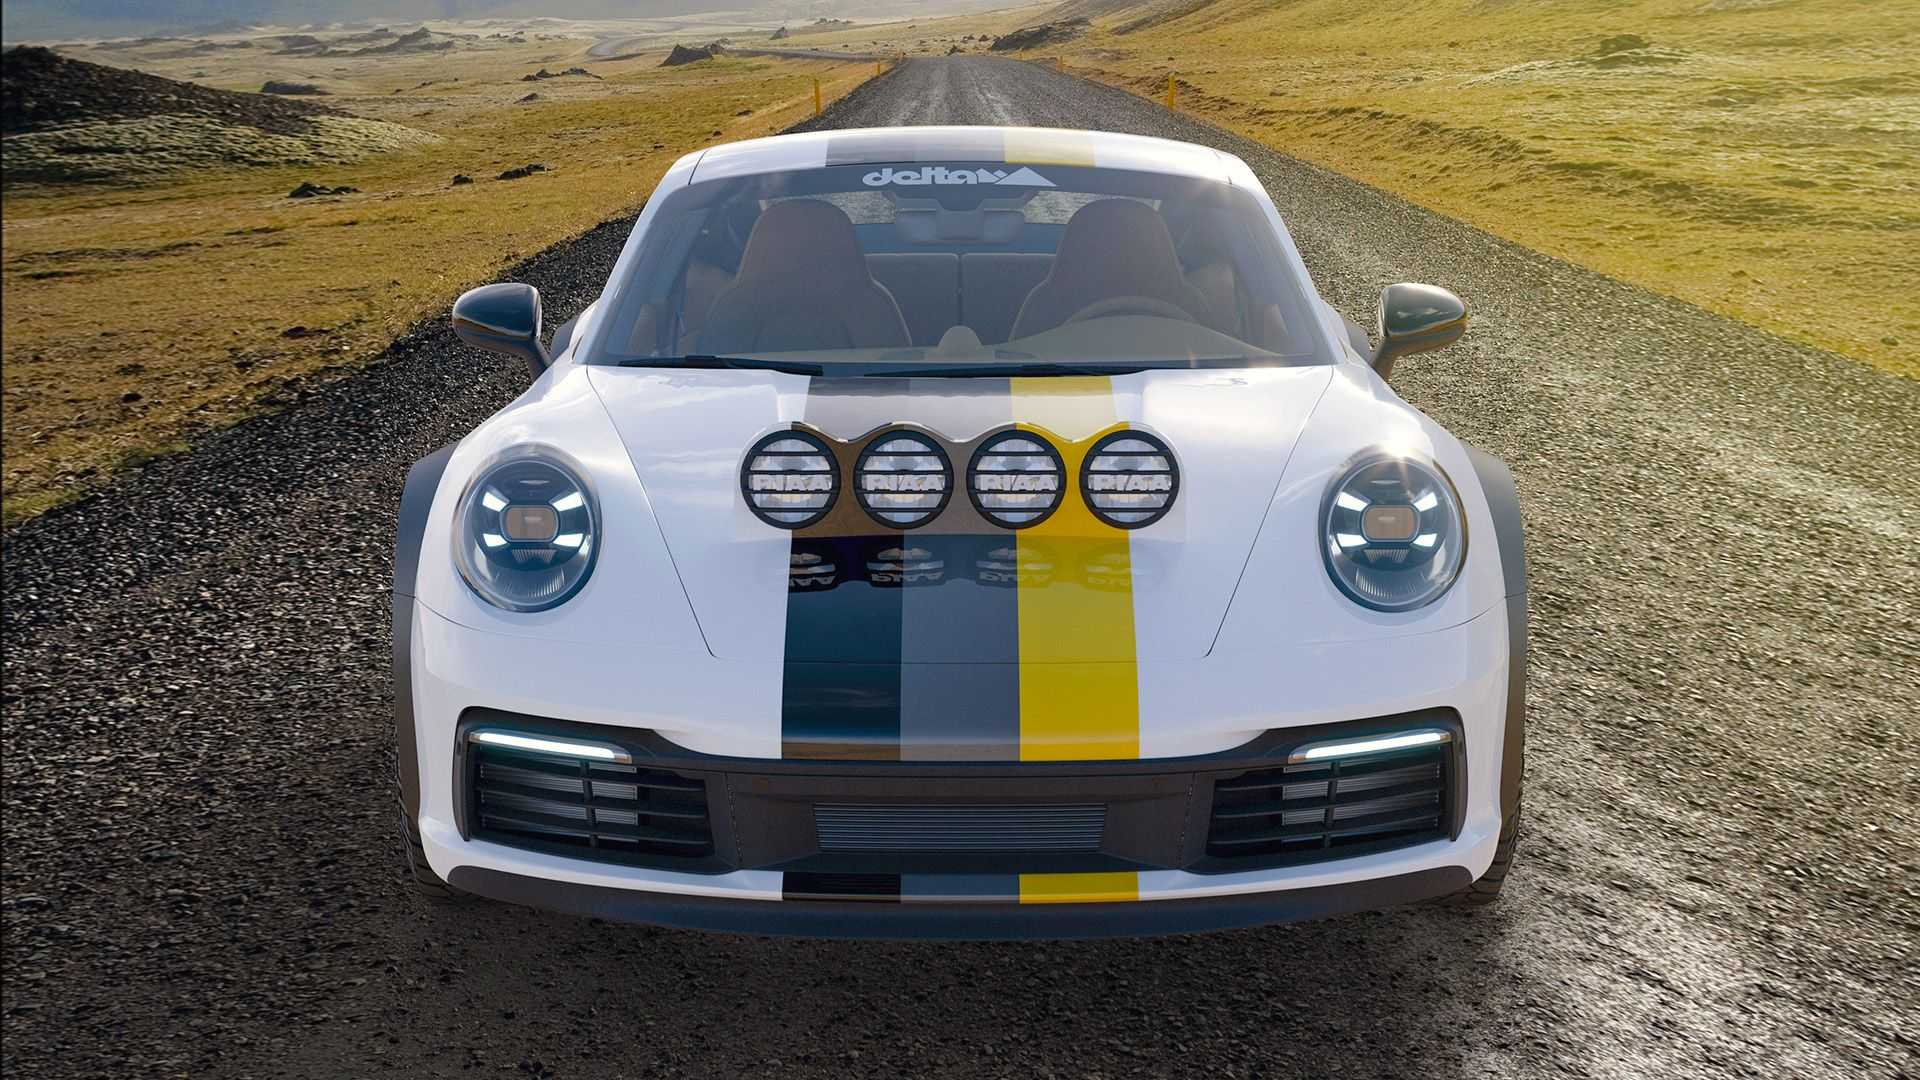 2018 - [Porsche] 911 - Page 20 Delta-4x4-porsche-dakar